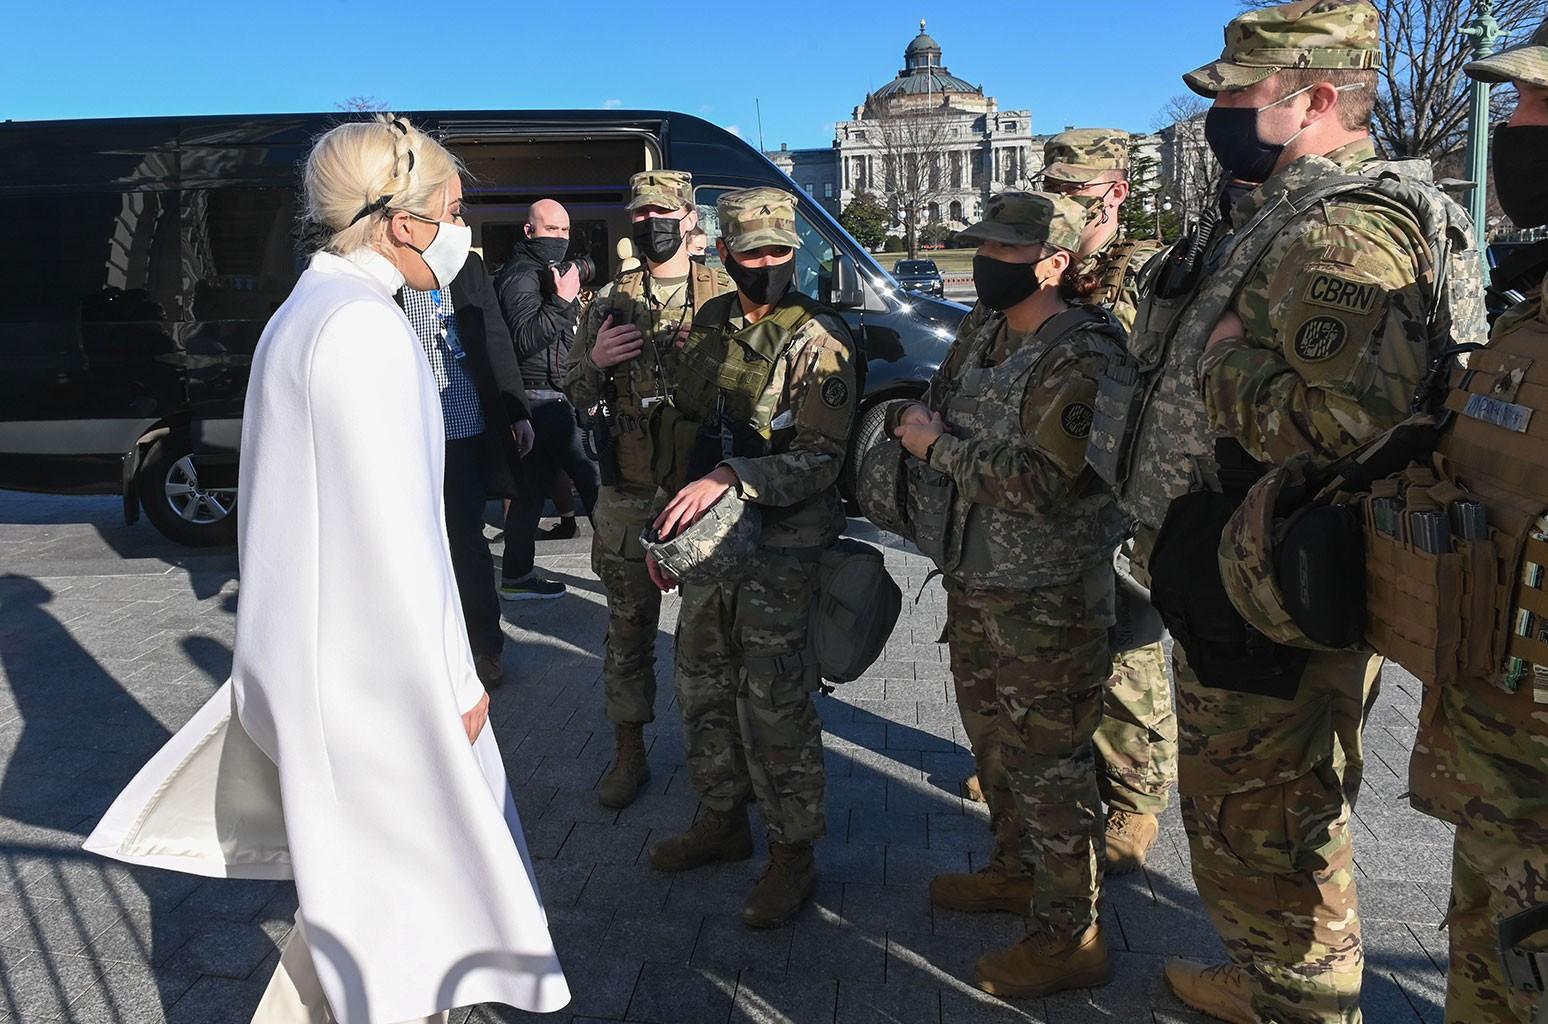 Lady Gaga in D.C.: Poses at Capitol Ahead of Inauguration | Billboard